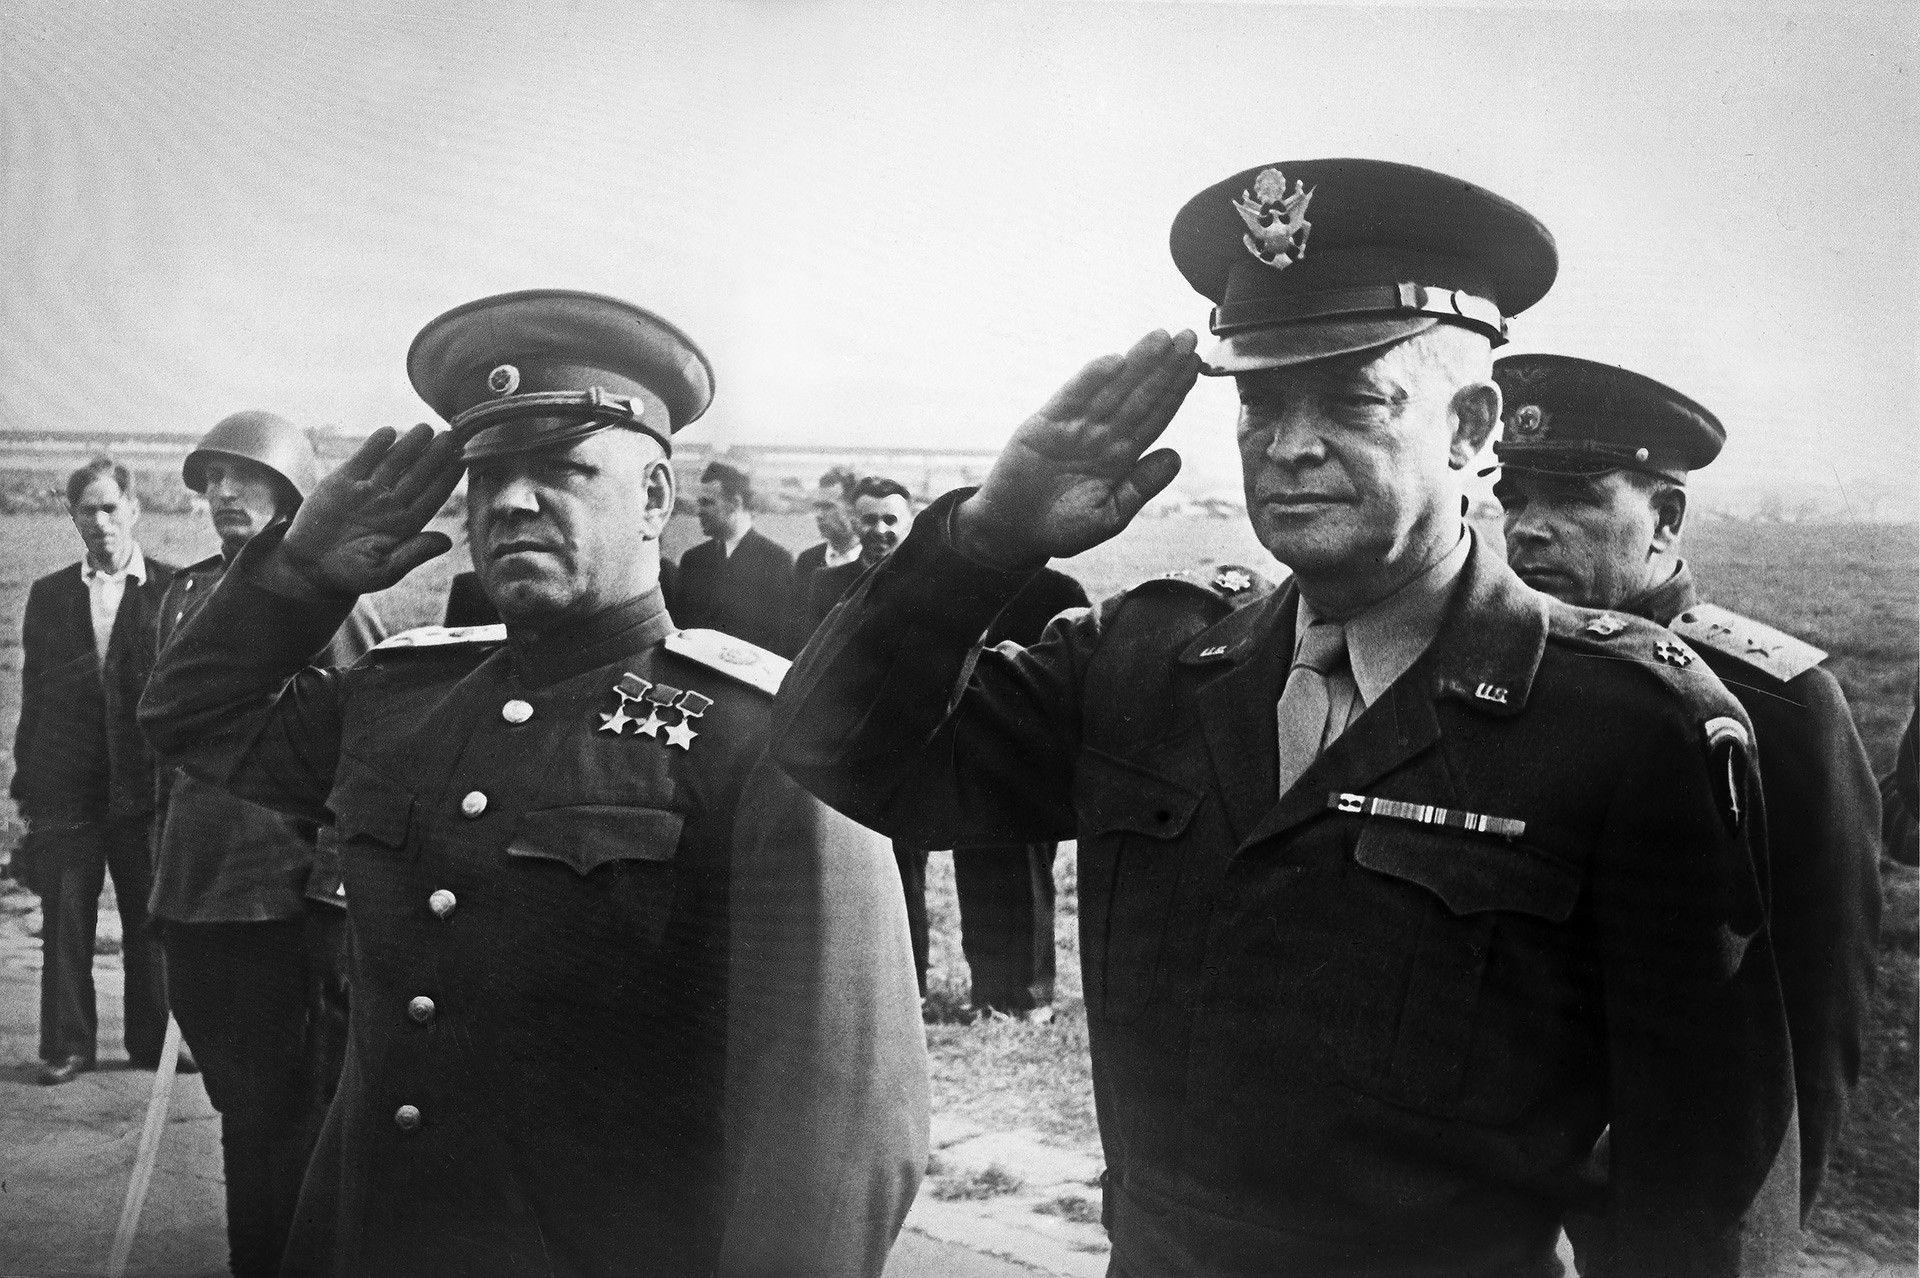 Gueorgui Zhúkov (a la izquierda) yDwight D. Eisenhower.